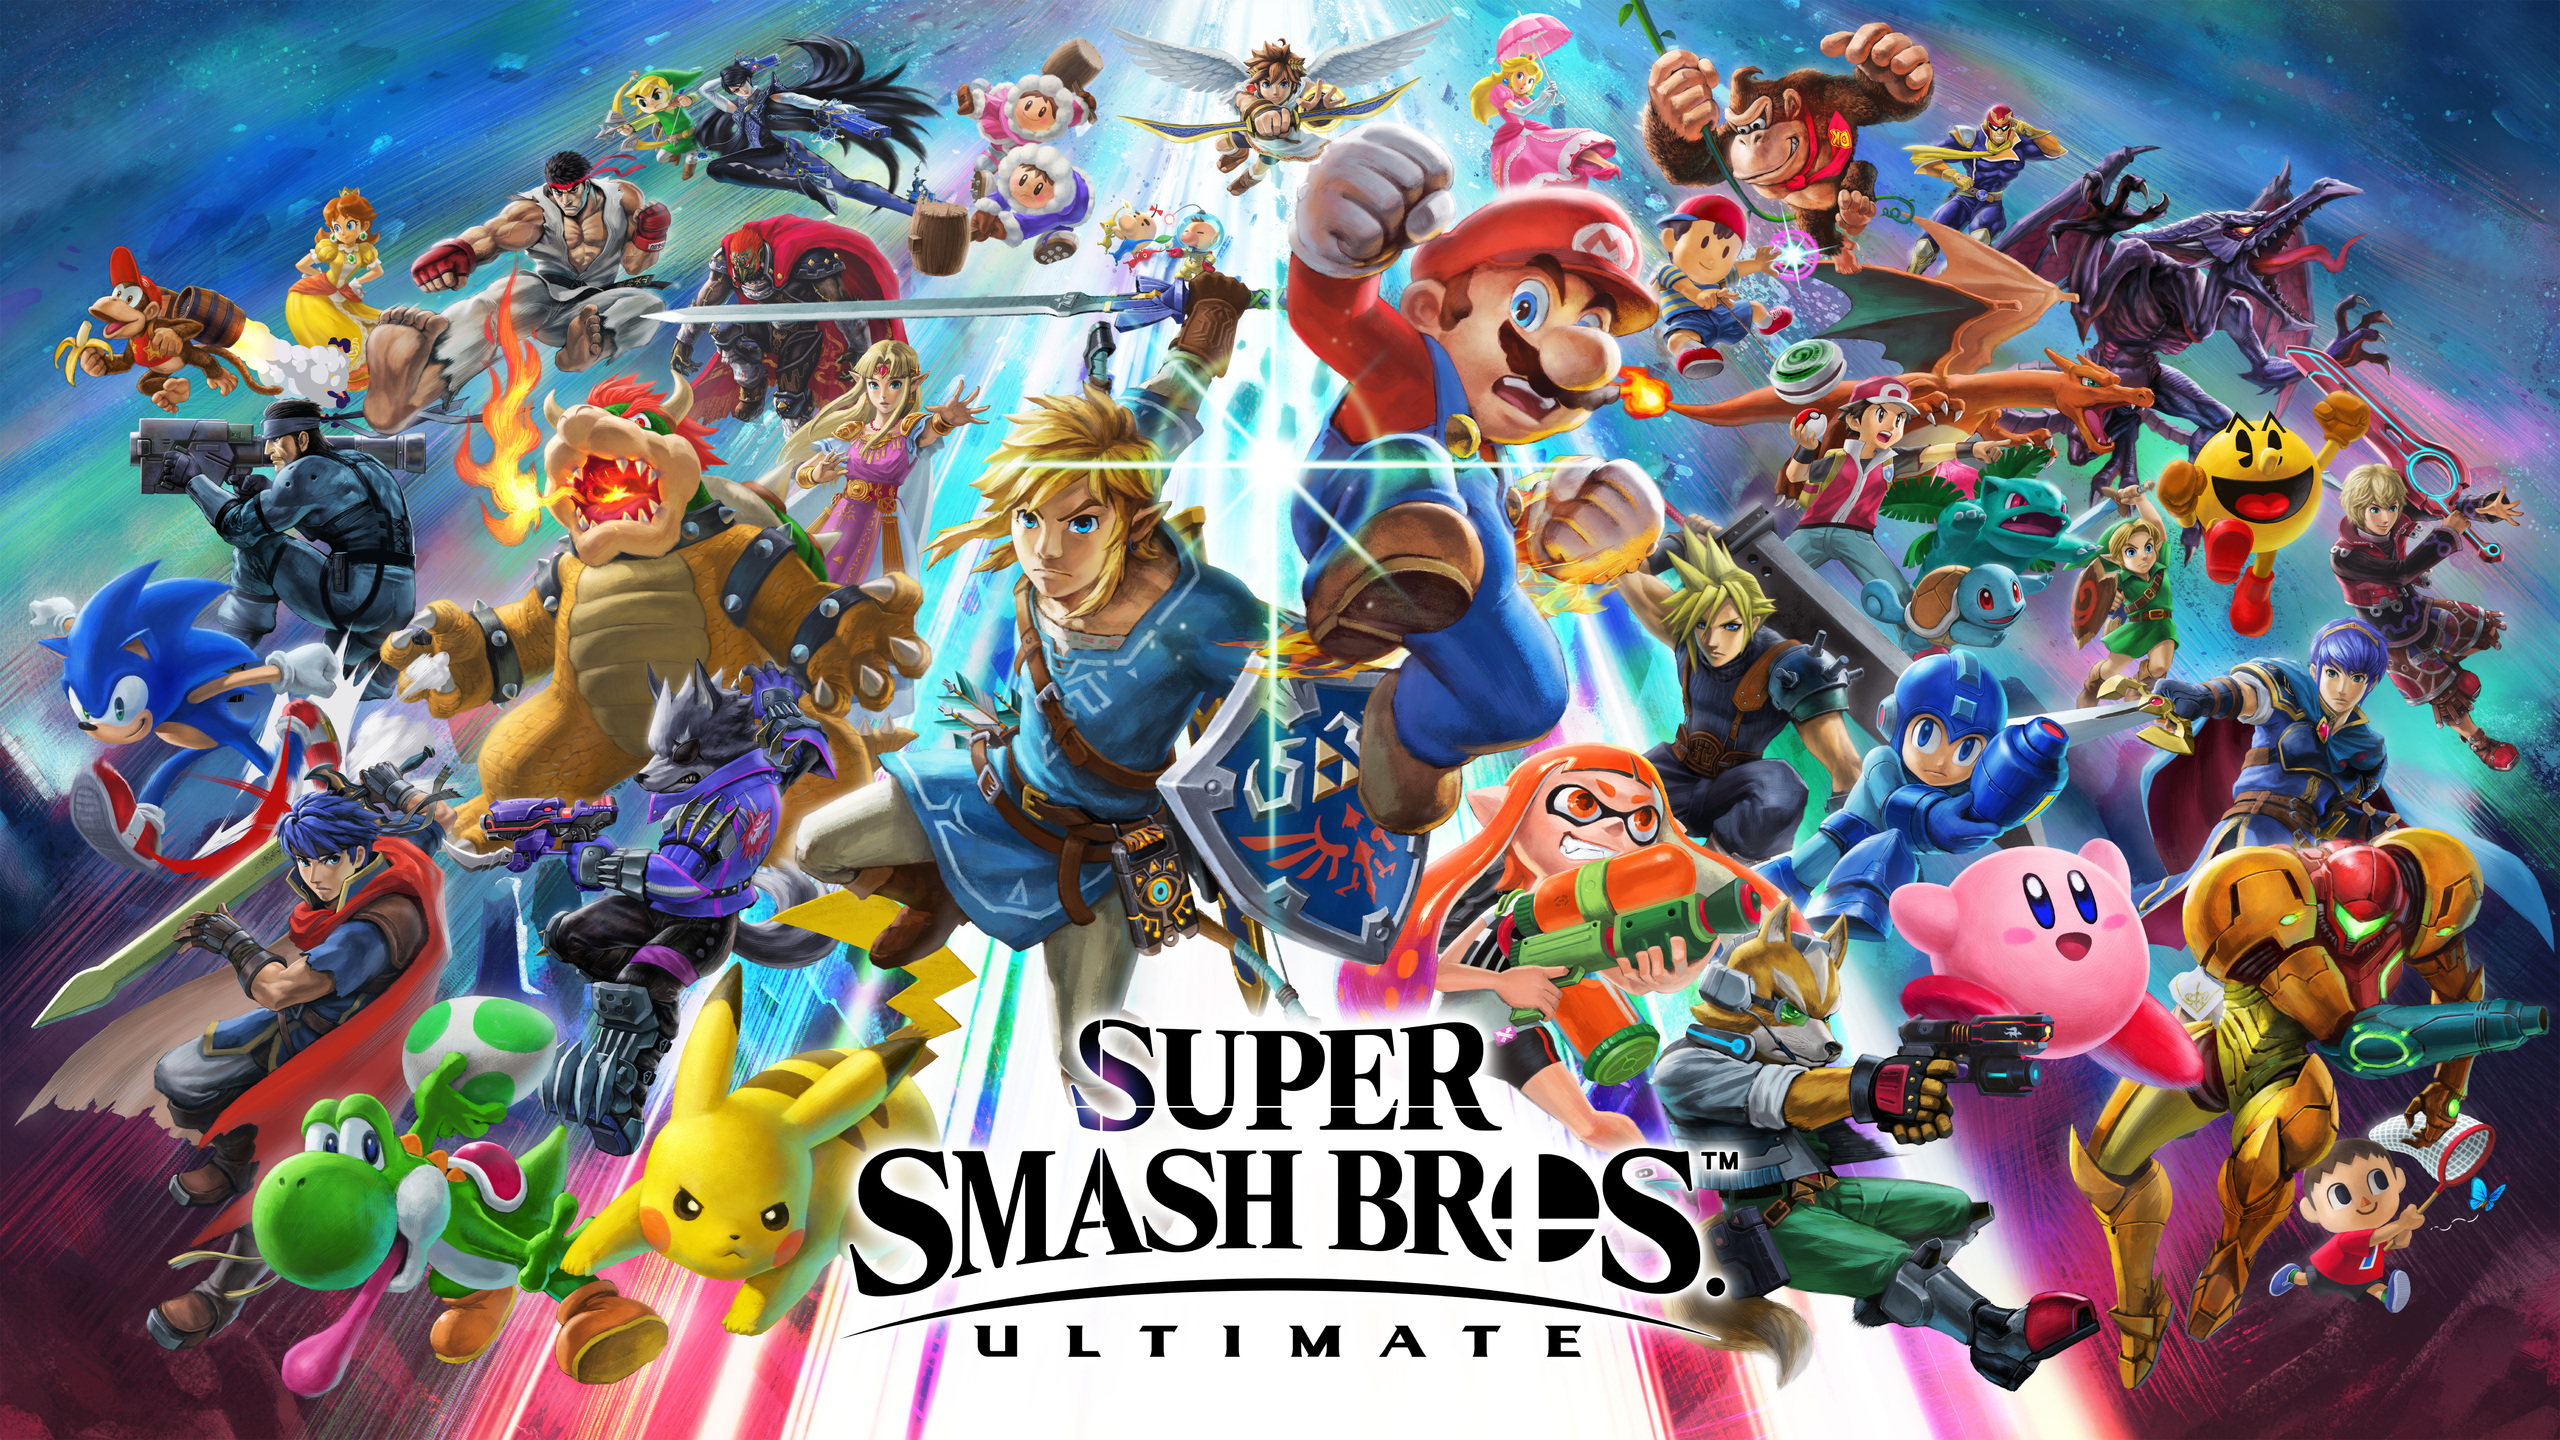 2560x1440 Super Smash Bros Ultimate 8k 1440P Resolution HD